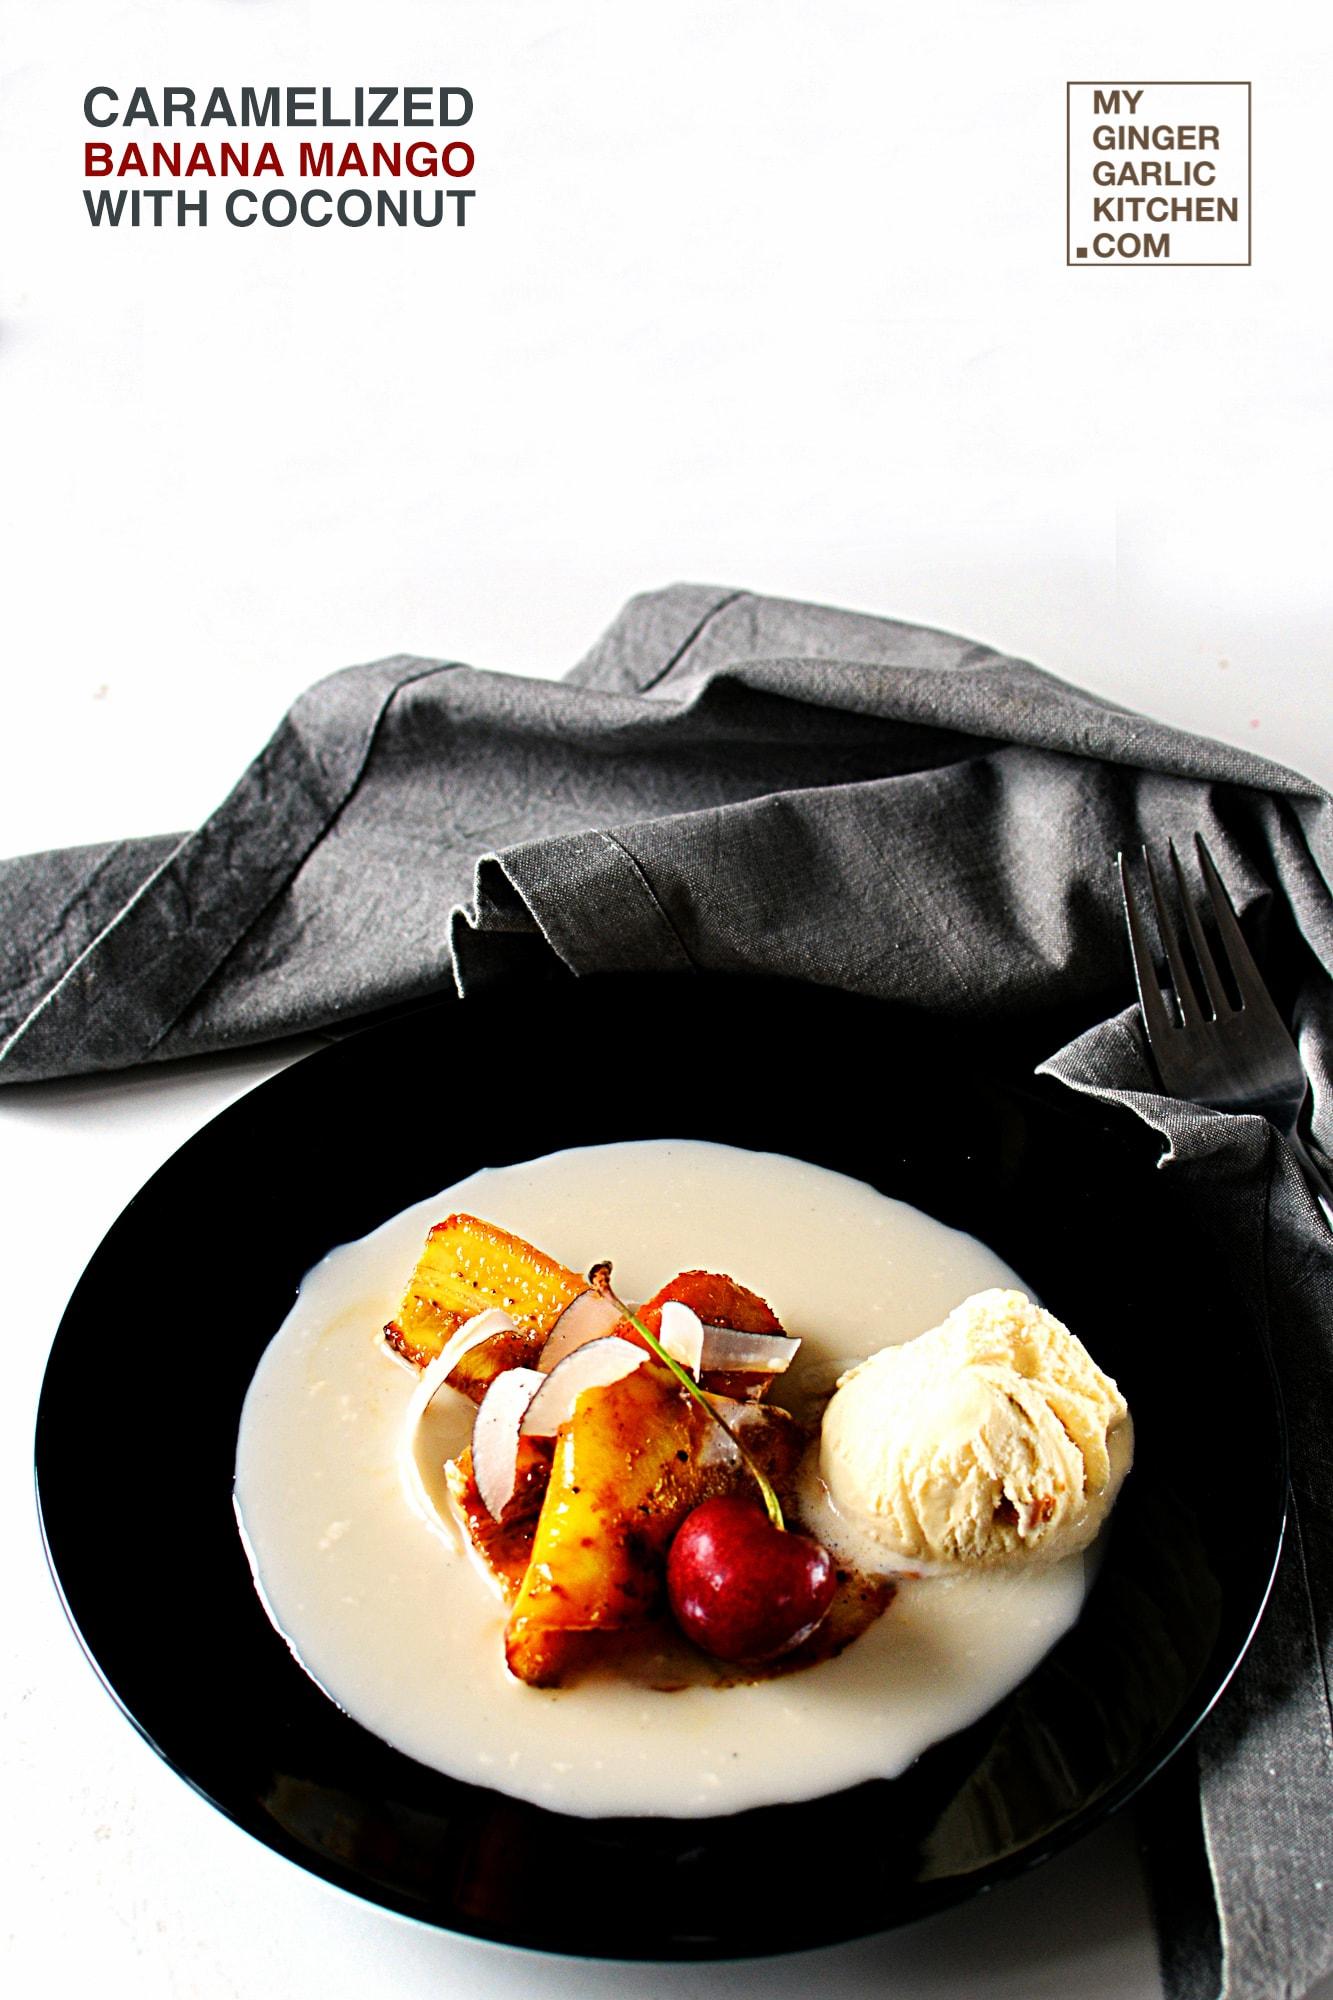 recipe-caramelized-banana-mango-with-coconut-anupama-paliwal-my-ginger-garlic-kitchen-1